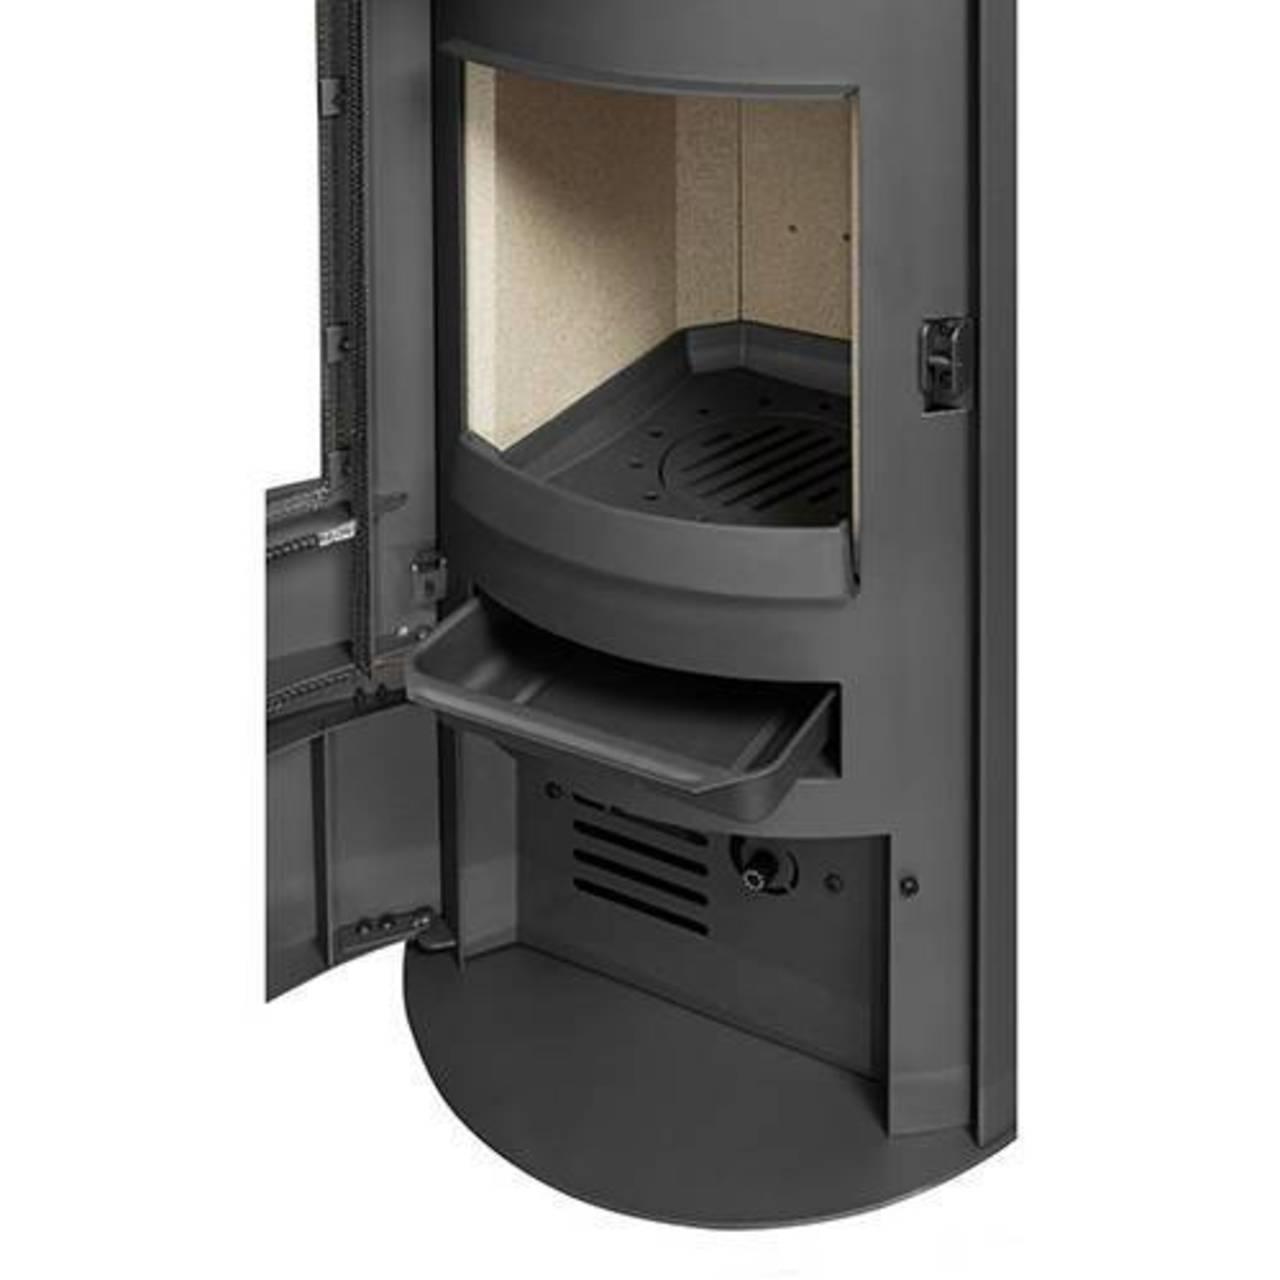 thermia kaminofen m nchen 7 kw dauerbrand automatik. Black Bedroom Furniture Sets. Home Design Ideas